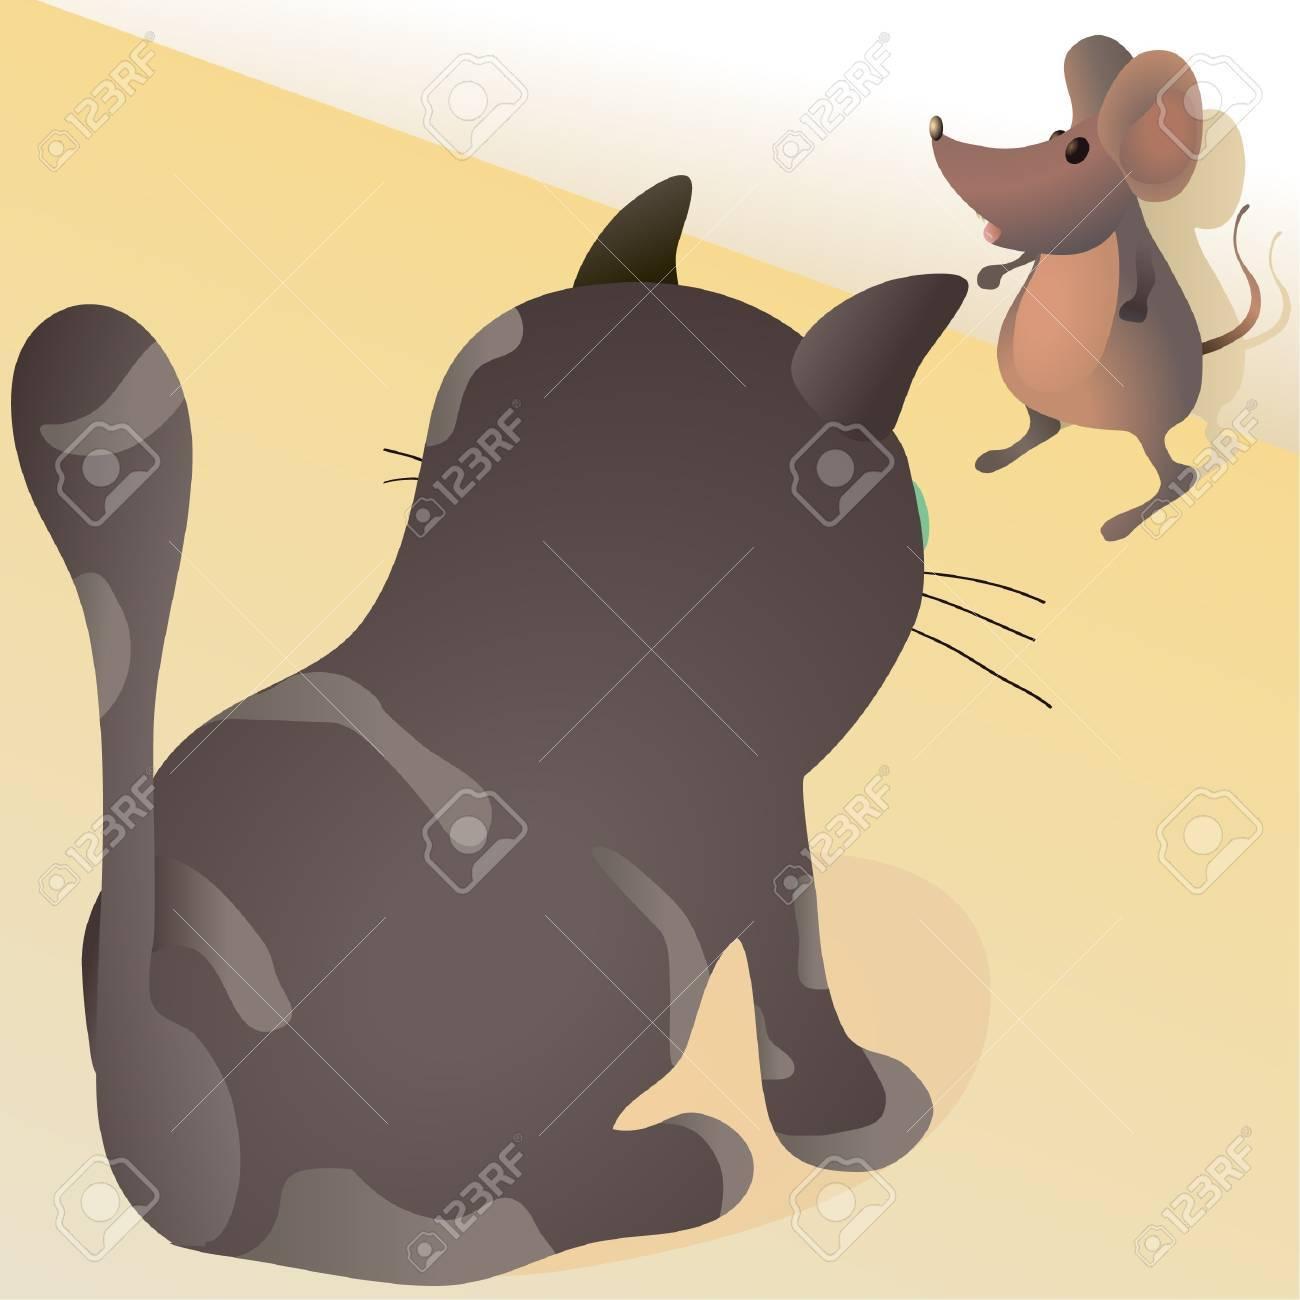 Little mouse against big cat Stock Vector - 15207219